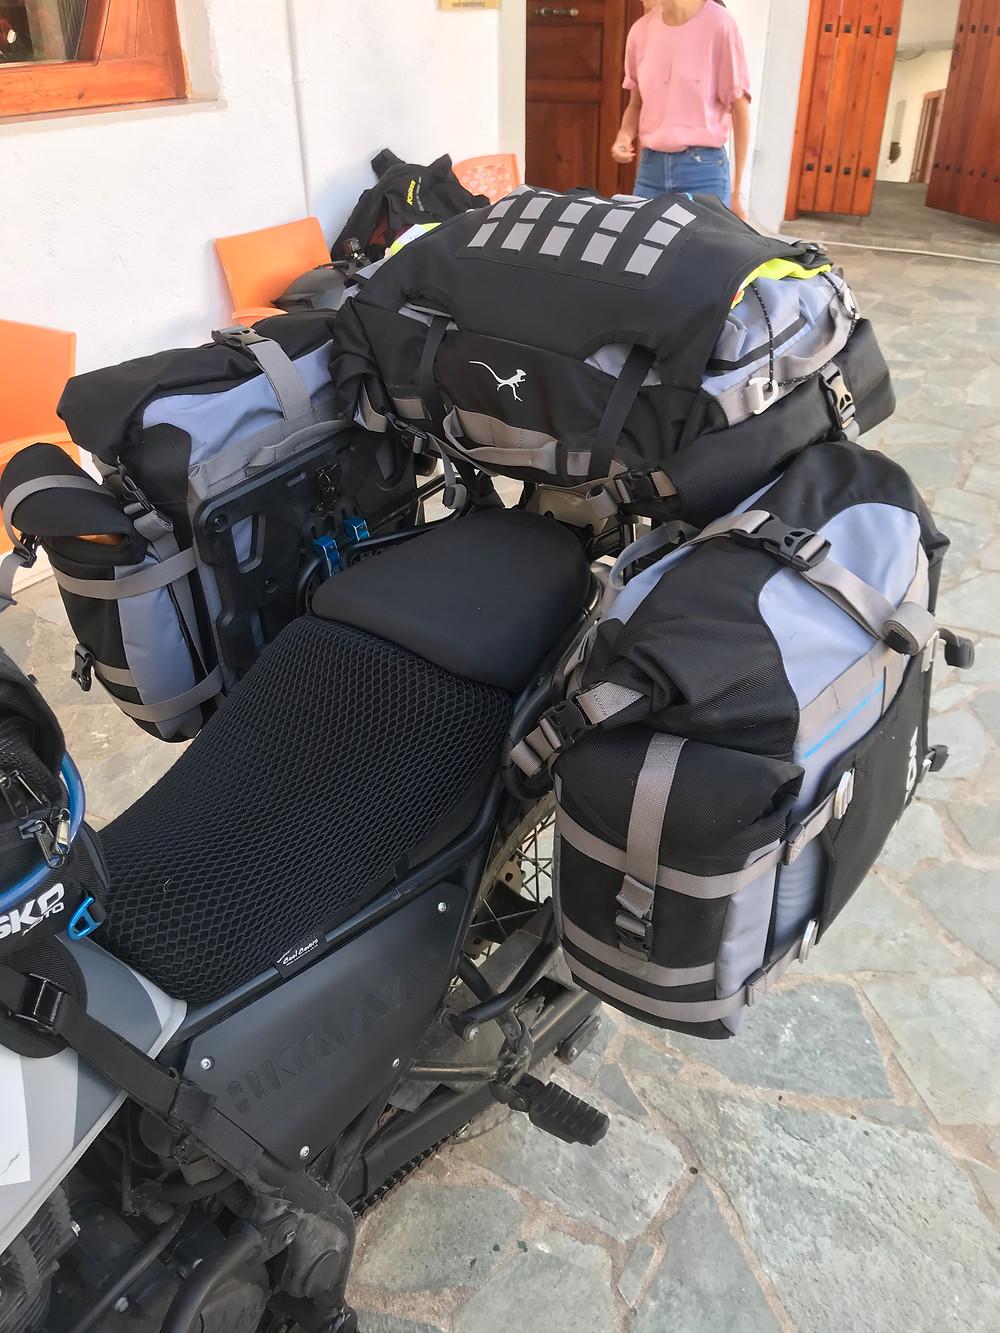 Mosko Moto backcountry side panniers Mosko Moto duffle bag review feedback test essai Bzk trails